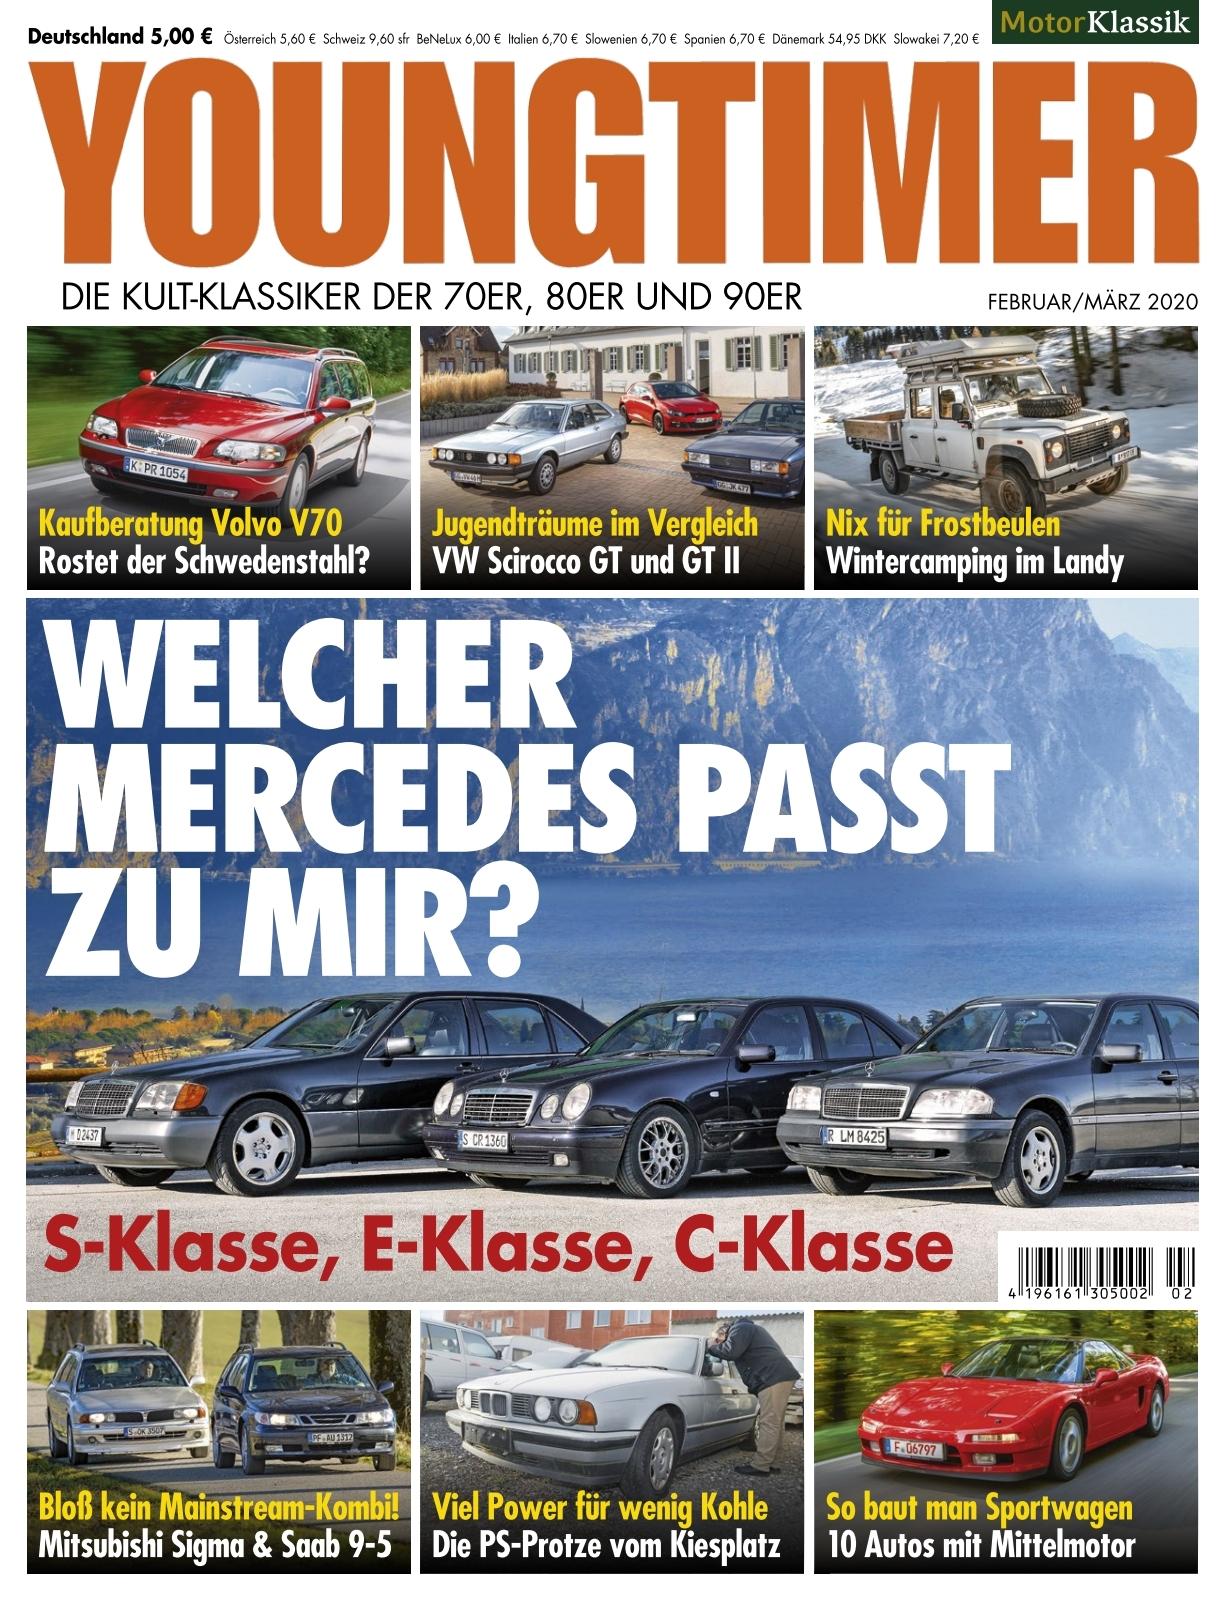 Gasfeder Heckklappe Dämpfer Heckklappendämpfer Fiat Croma Kombi 2.2 16v